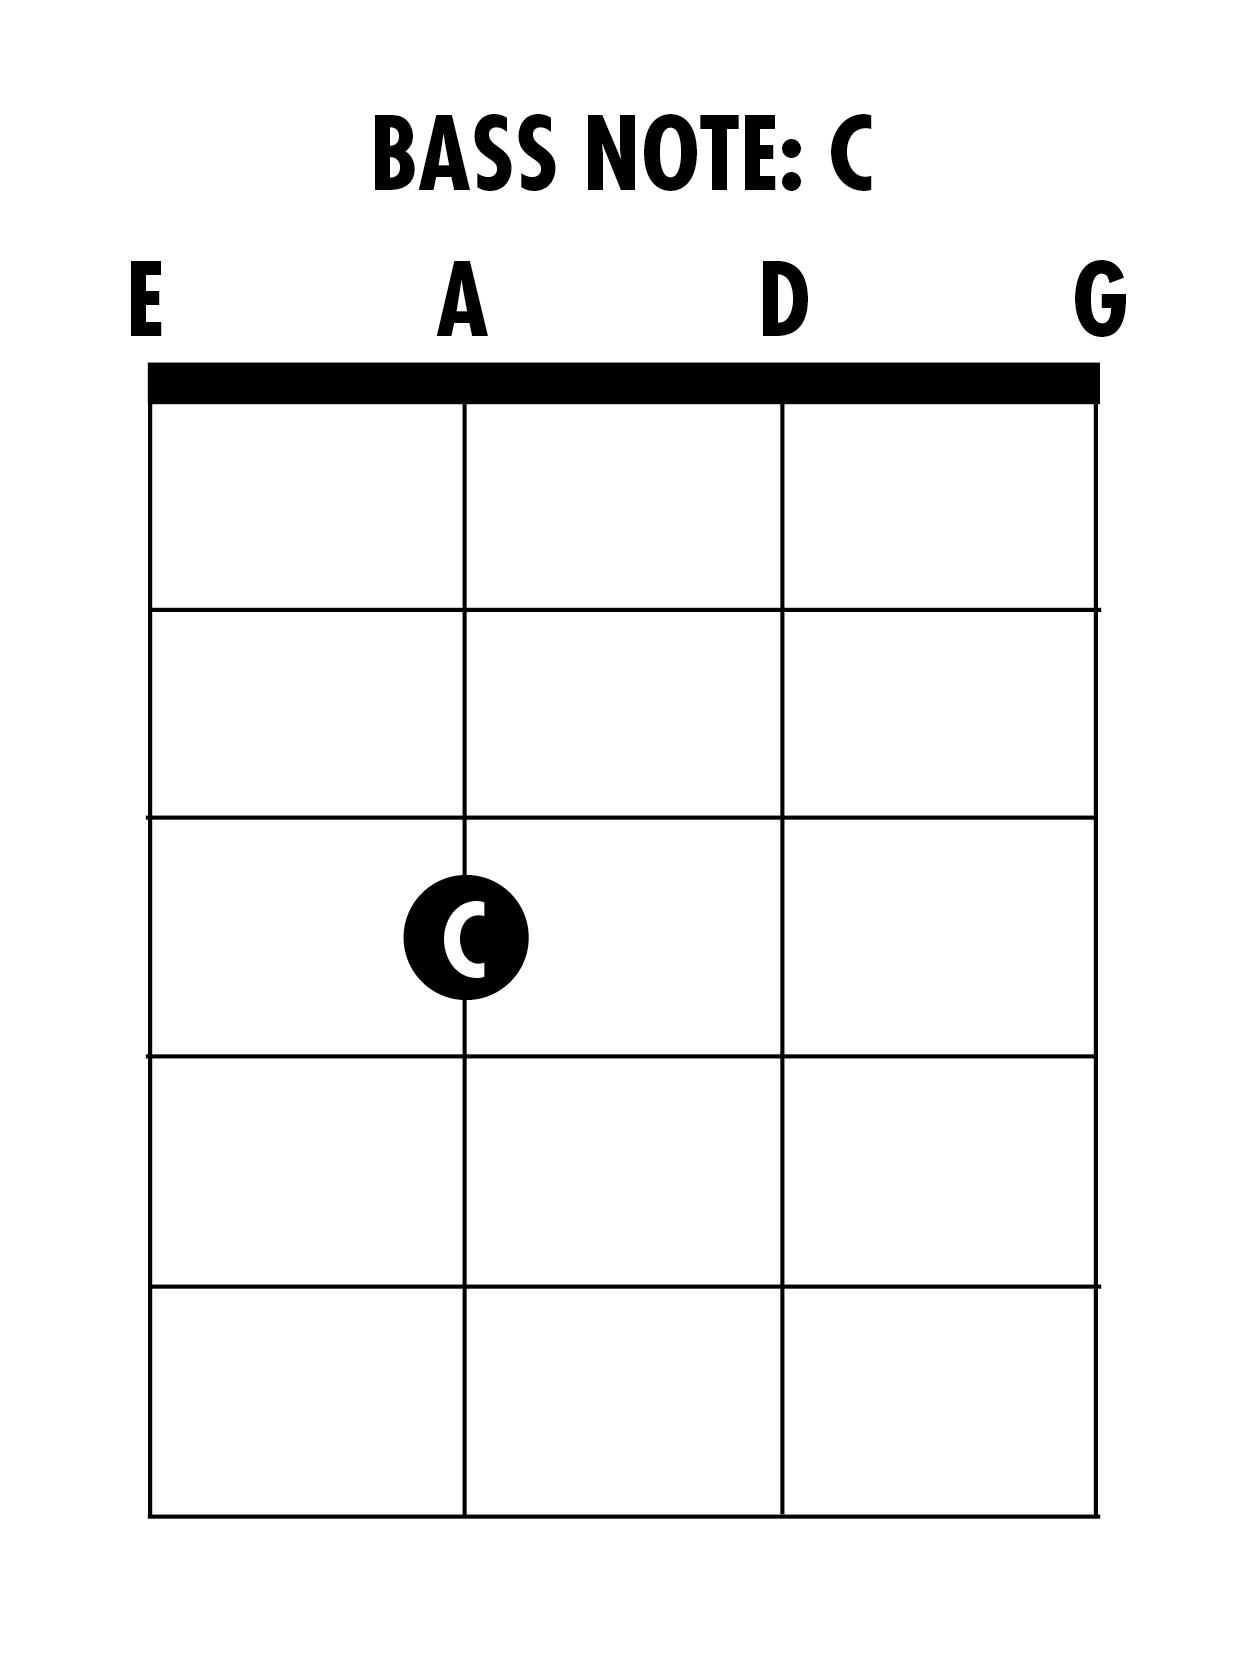 Bass G Scale - C.jpg